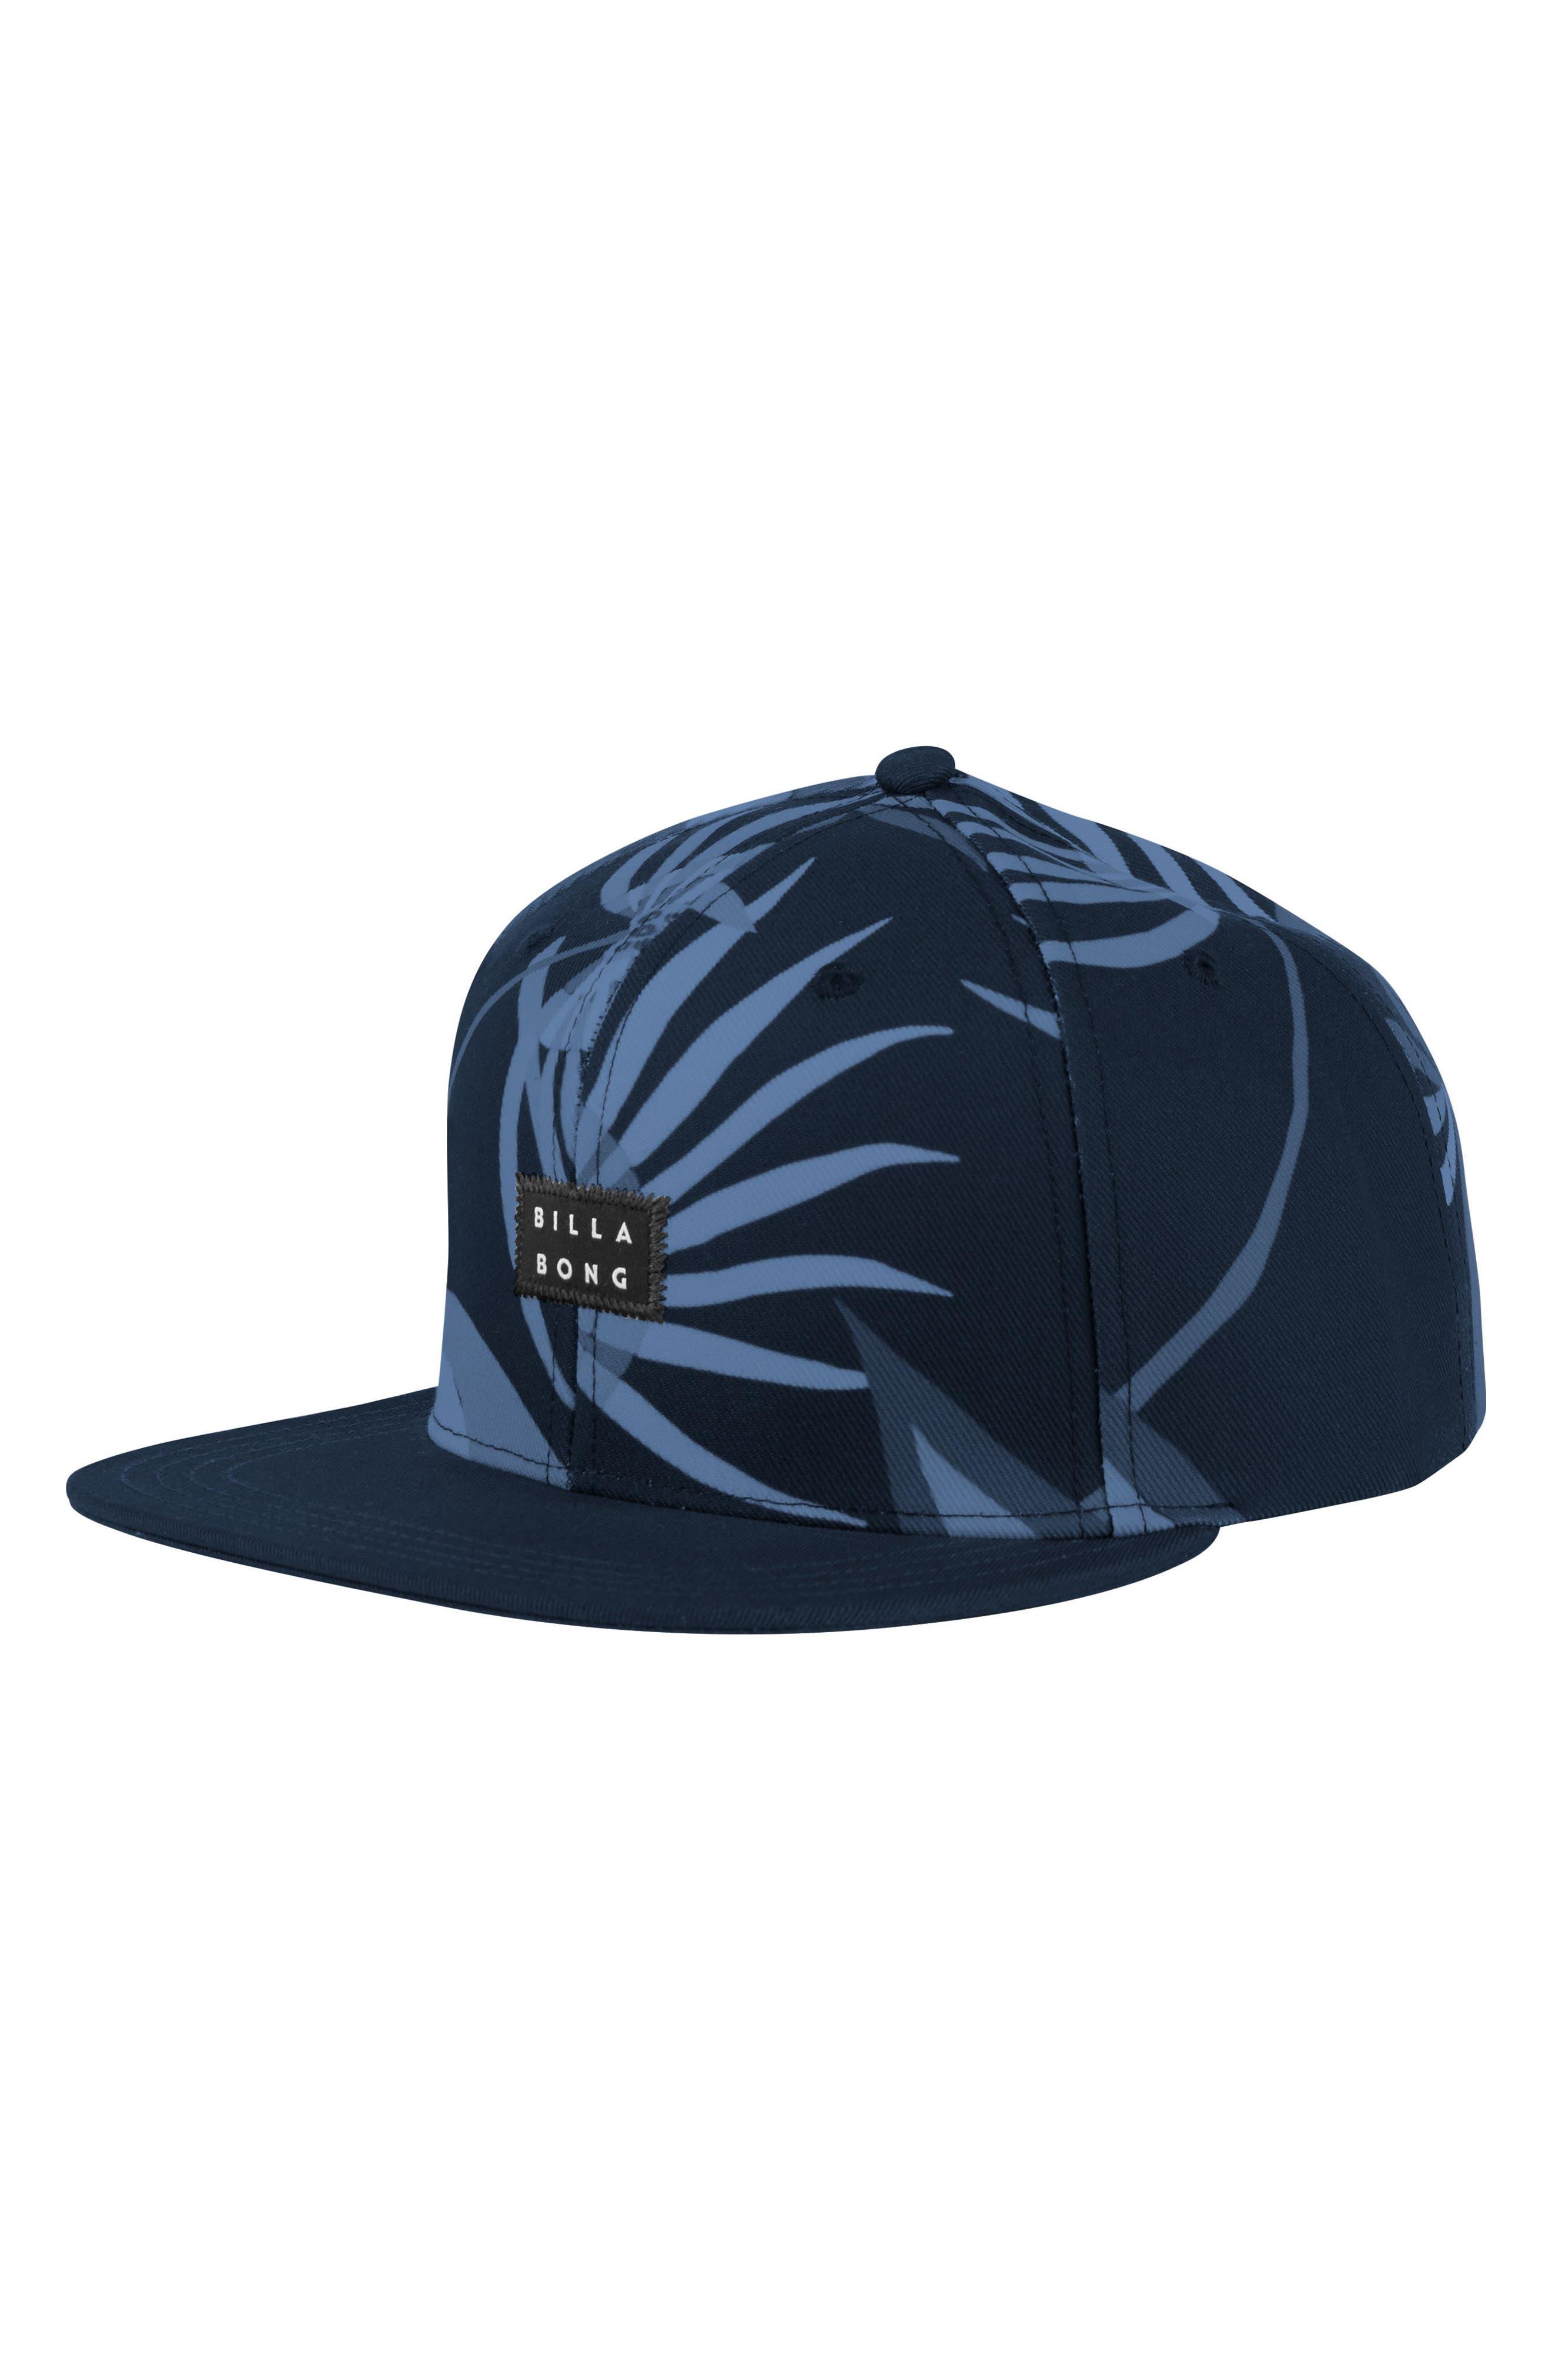 Main Image - Billabong Sundays Snapback Hat